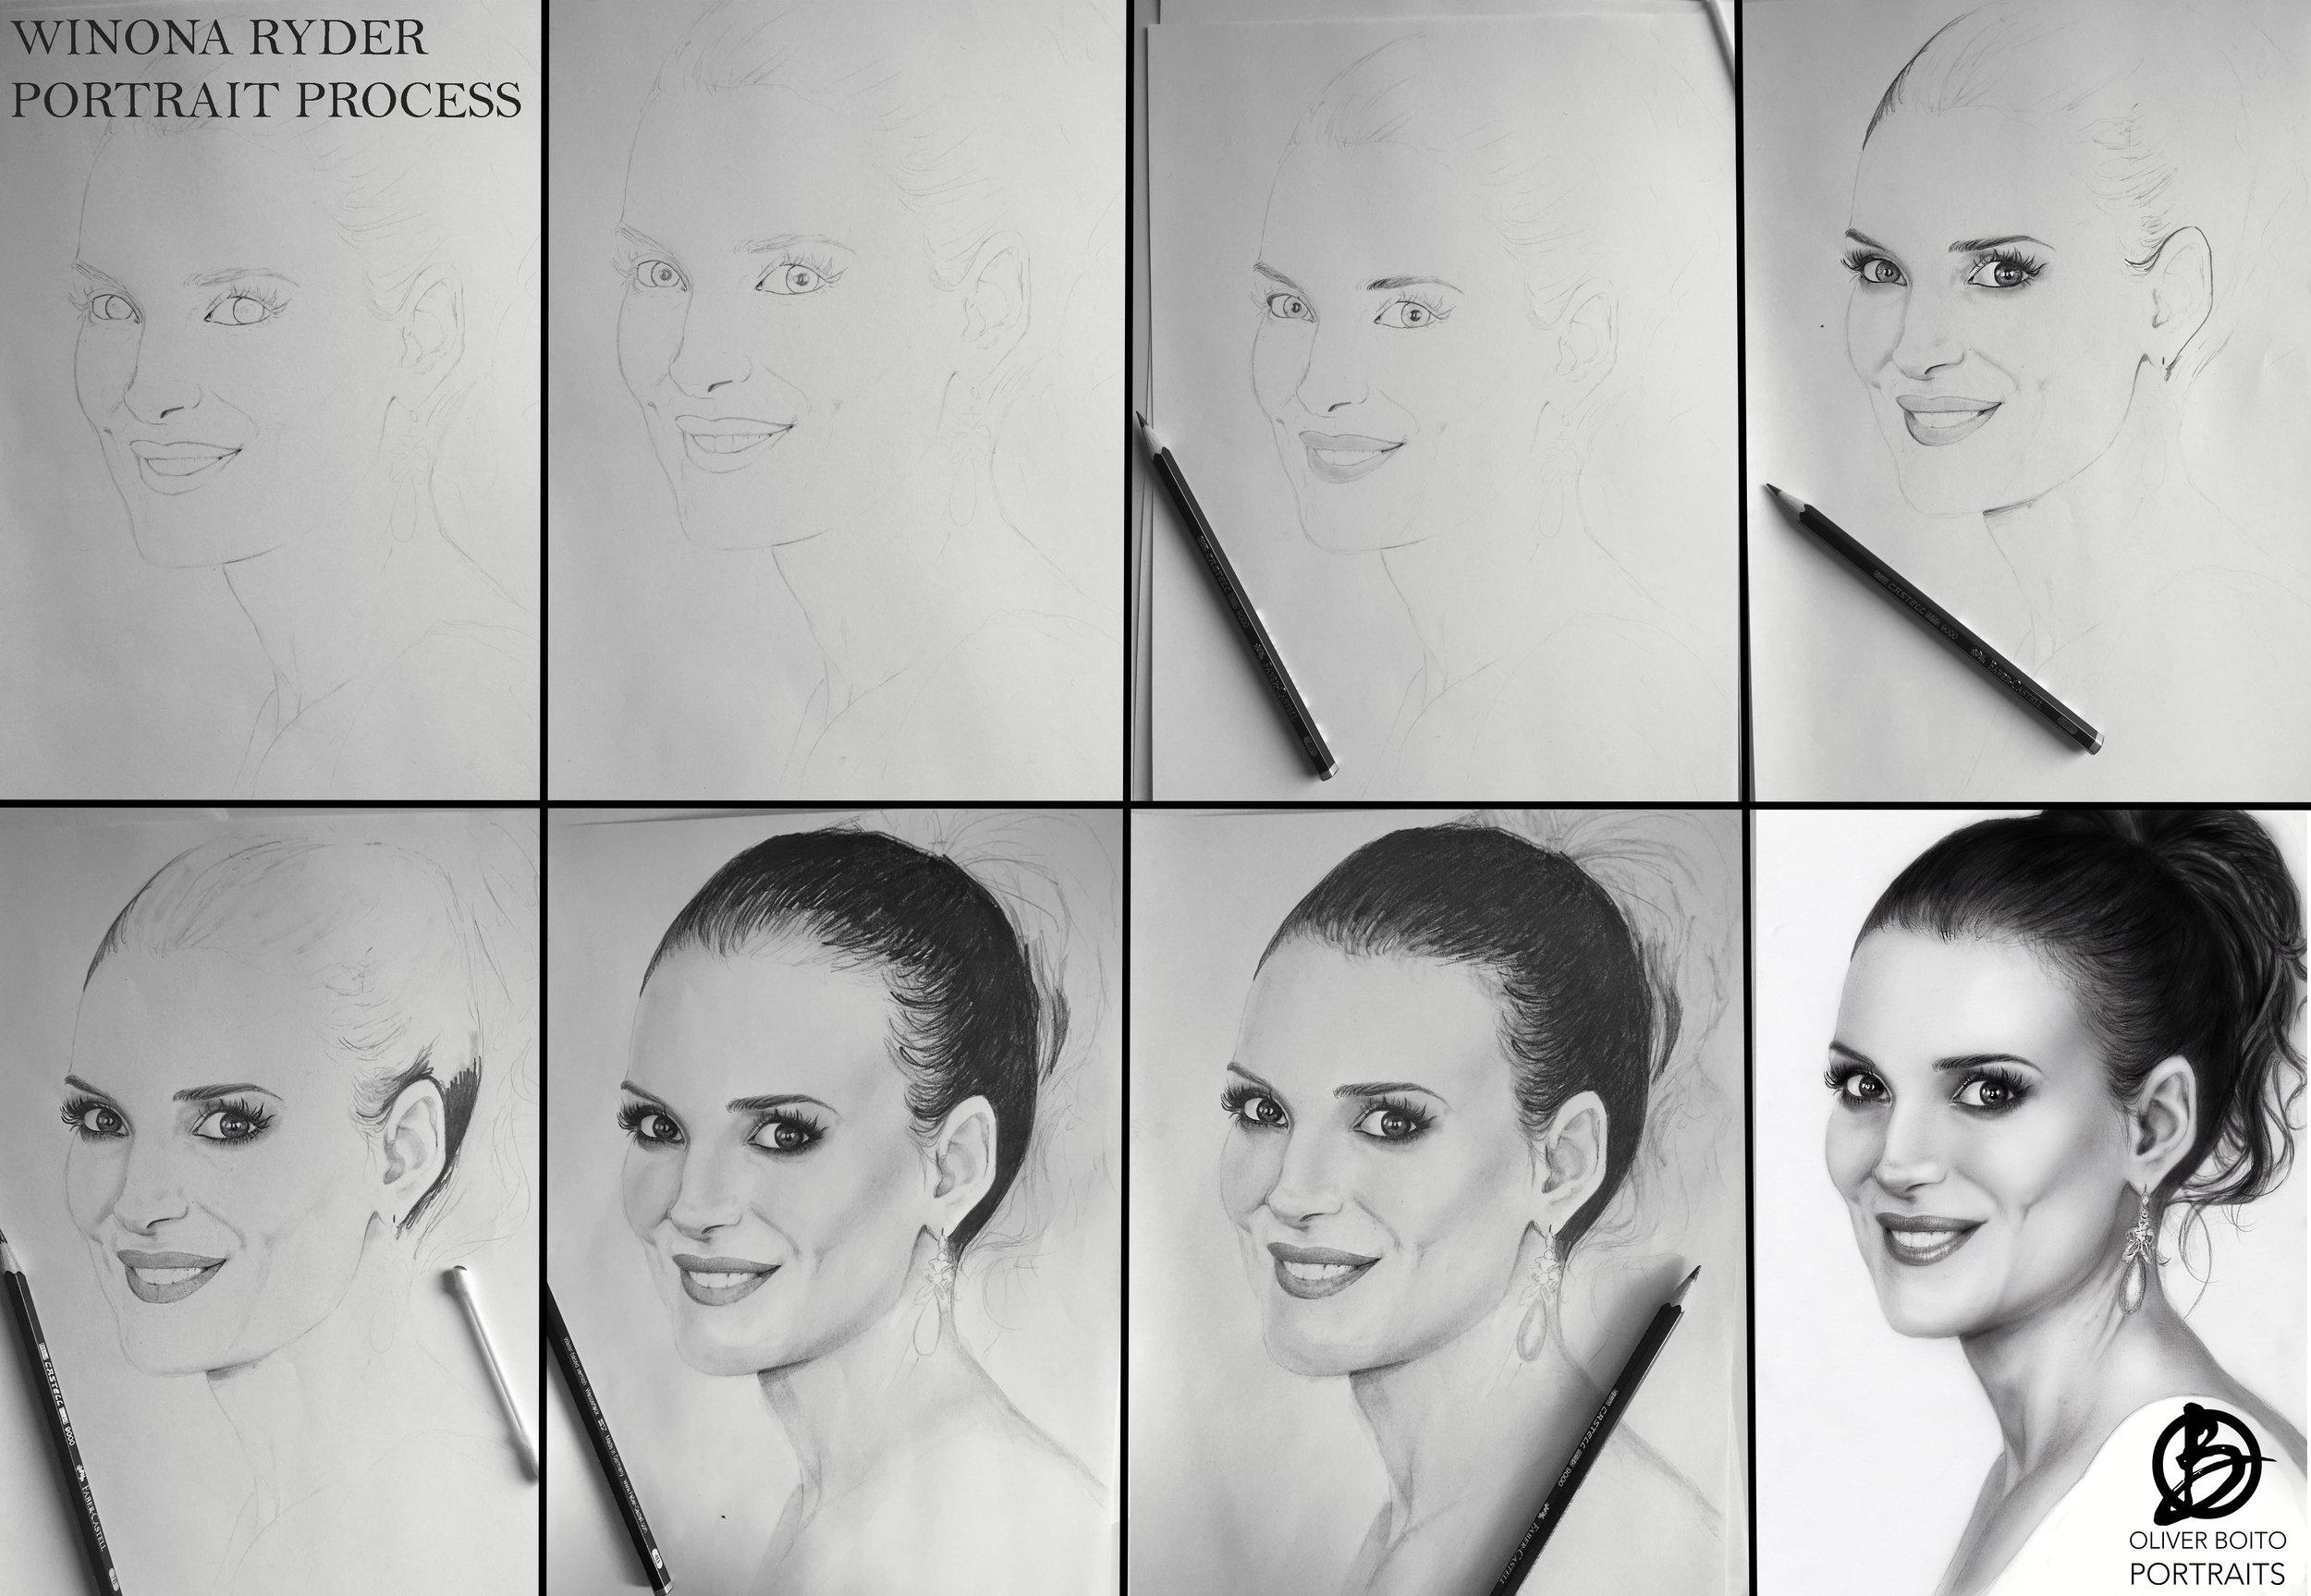 Winona Ryder portrait process